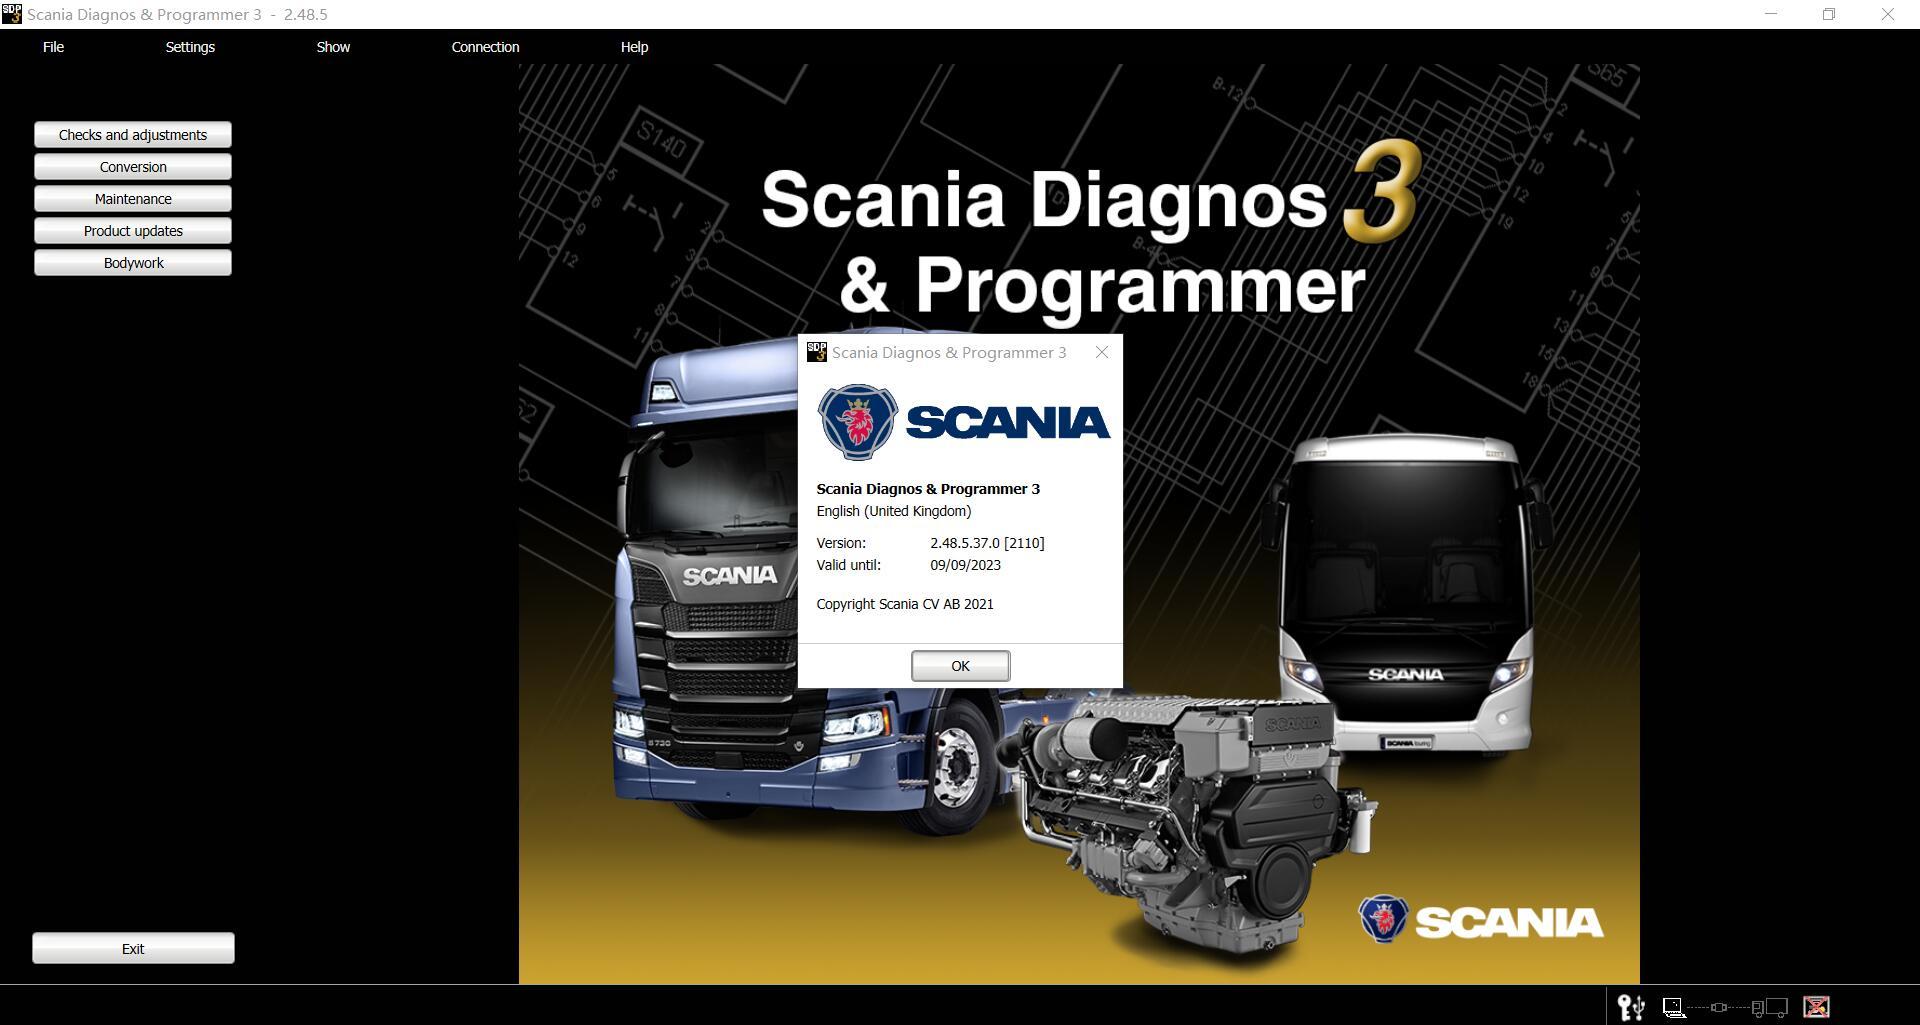 [09.2021] Scania SDP3 2.48.5